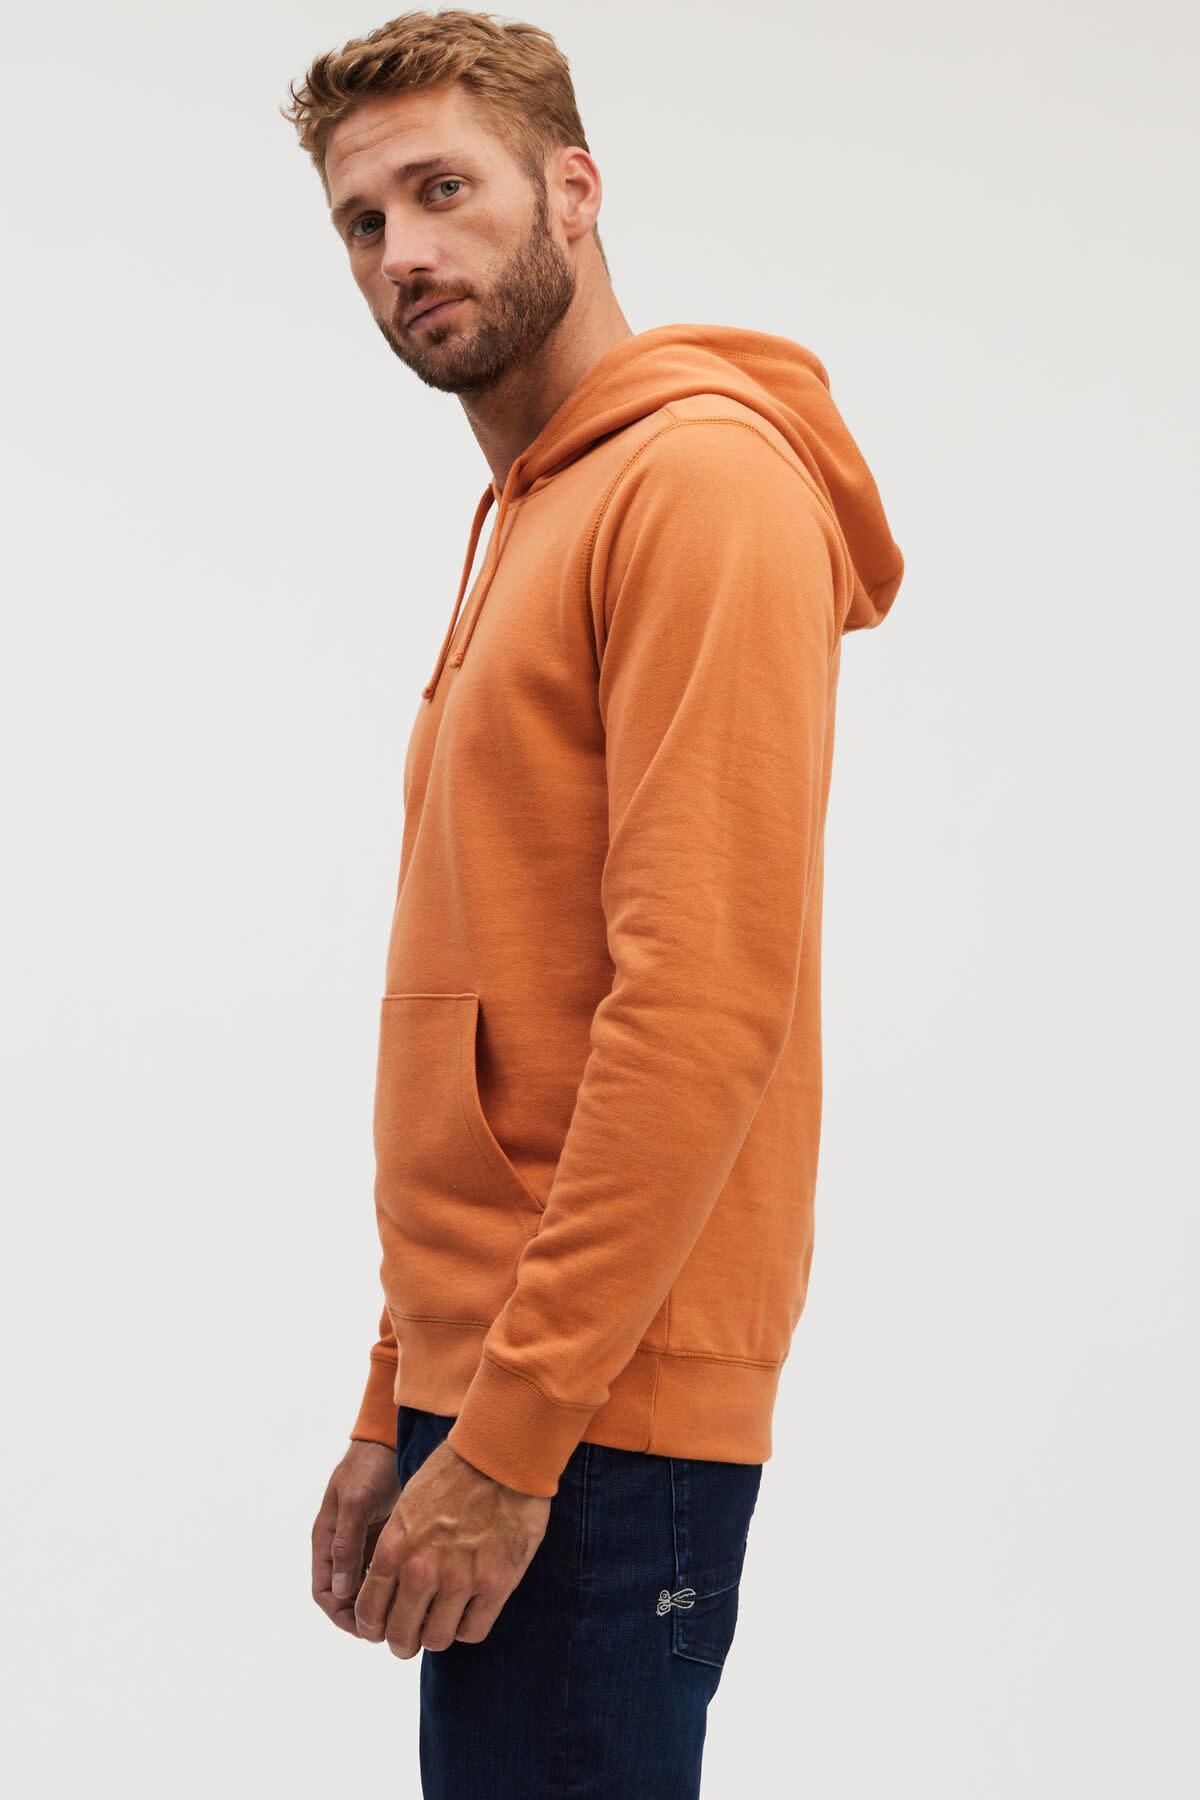 6 o clock  pocket Hoody orange-2